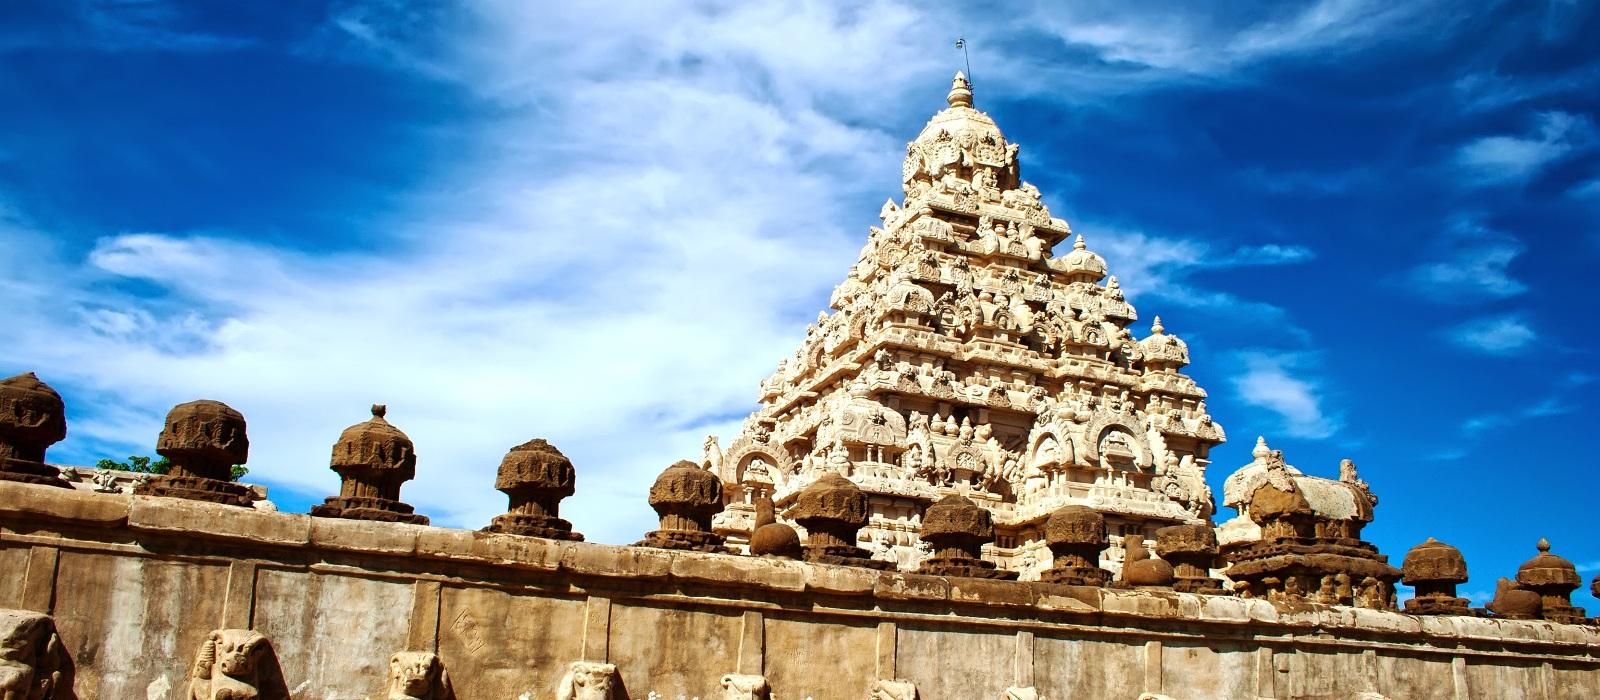 Safari Tours And Travels Chennai